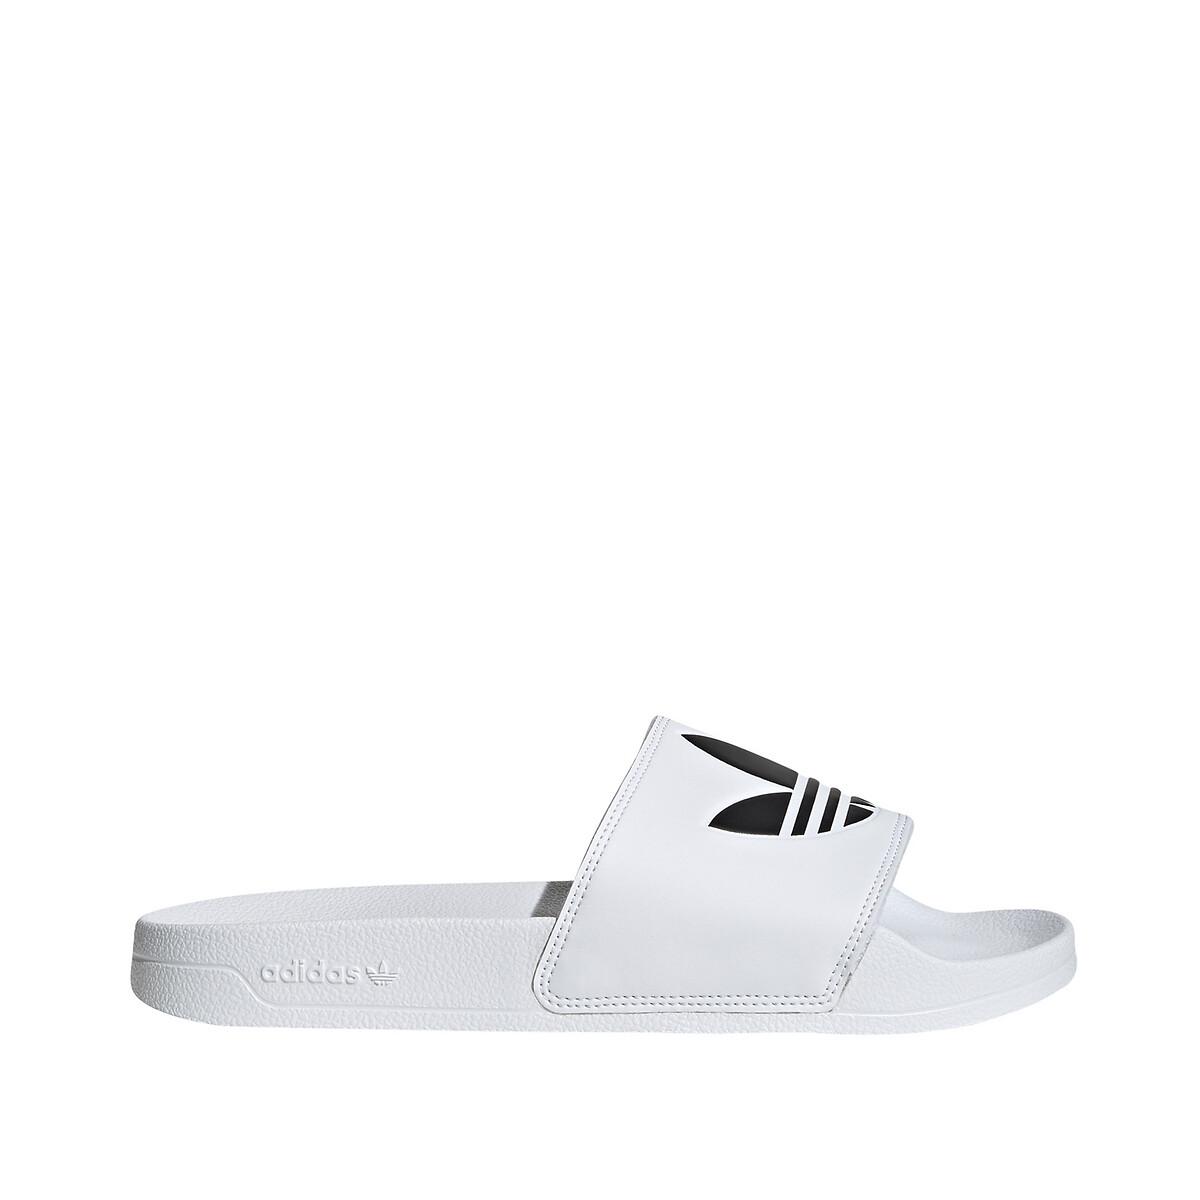 Adidas Originals Adilette Lite badslippers wit/zwart online kopen